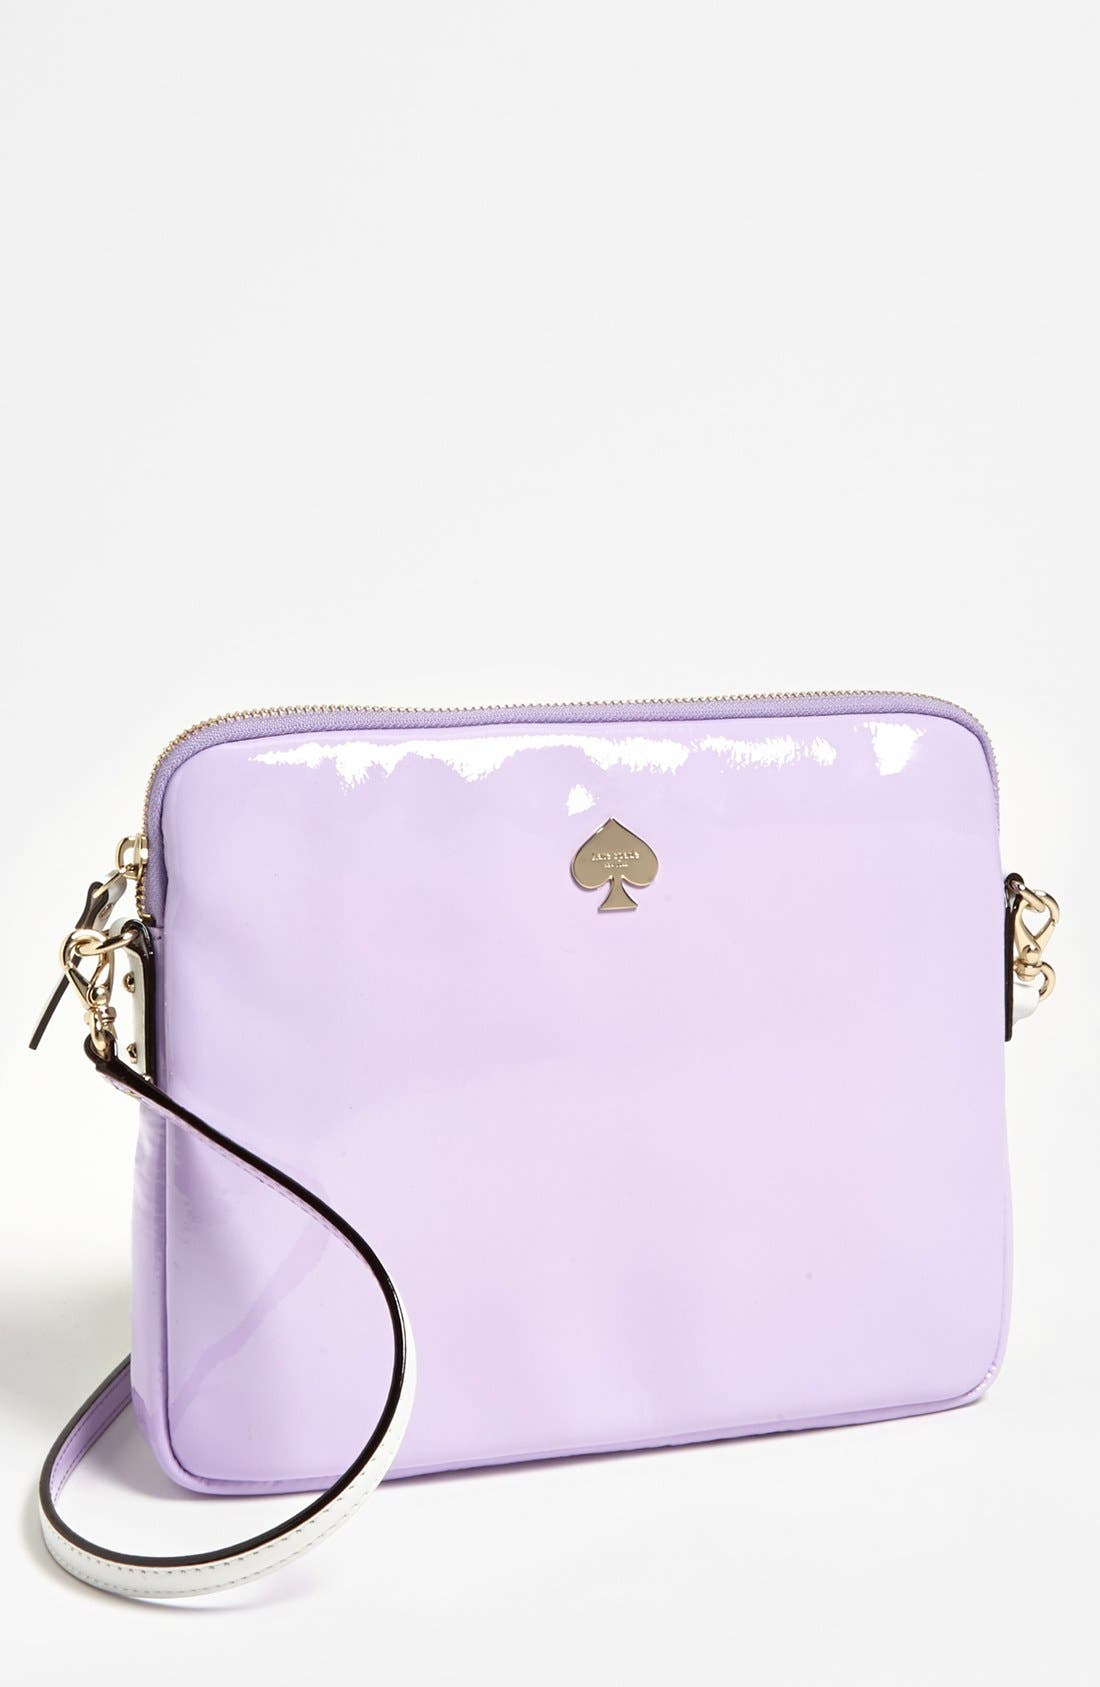 Alternate Image 1 Selected - kate spade new york 'bryce - flicker' patent leather iPad crossbody bag